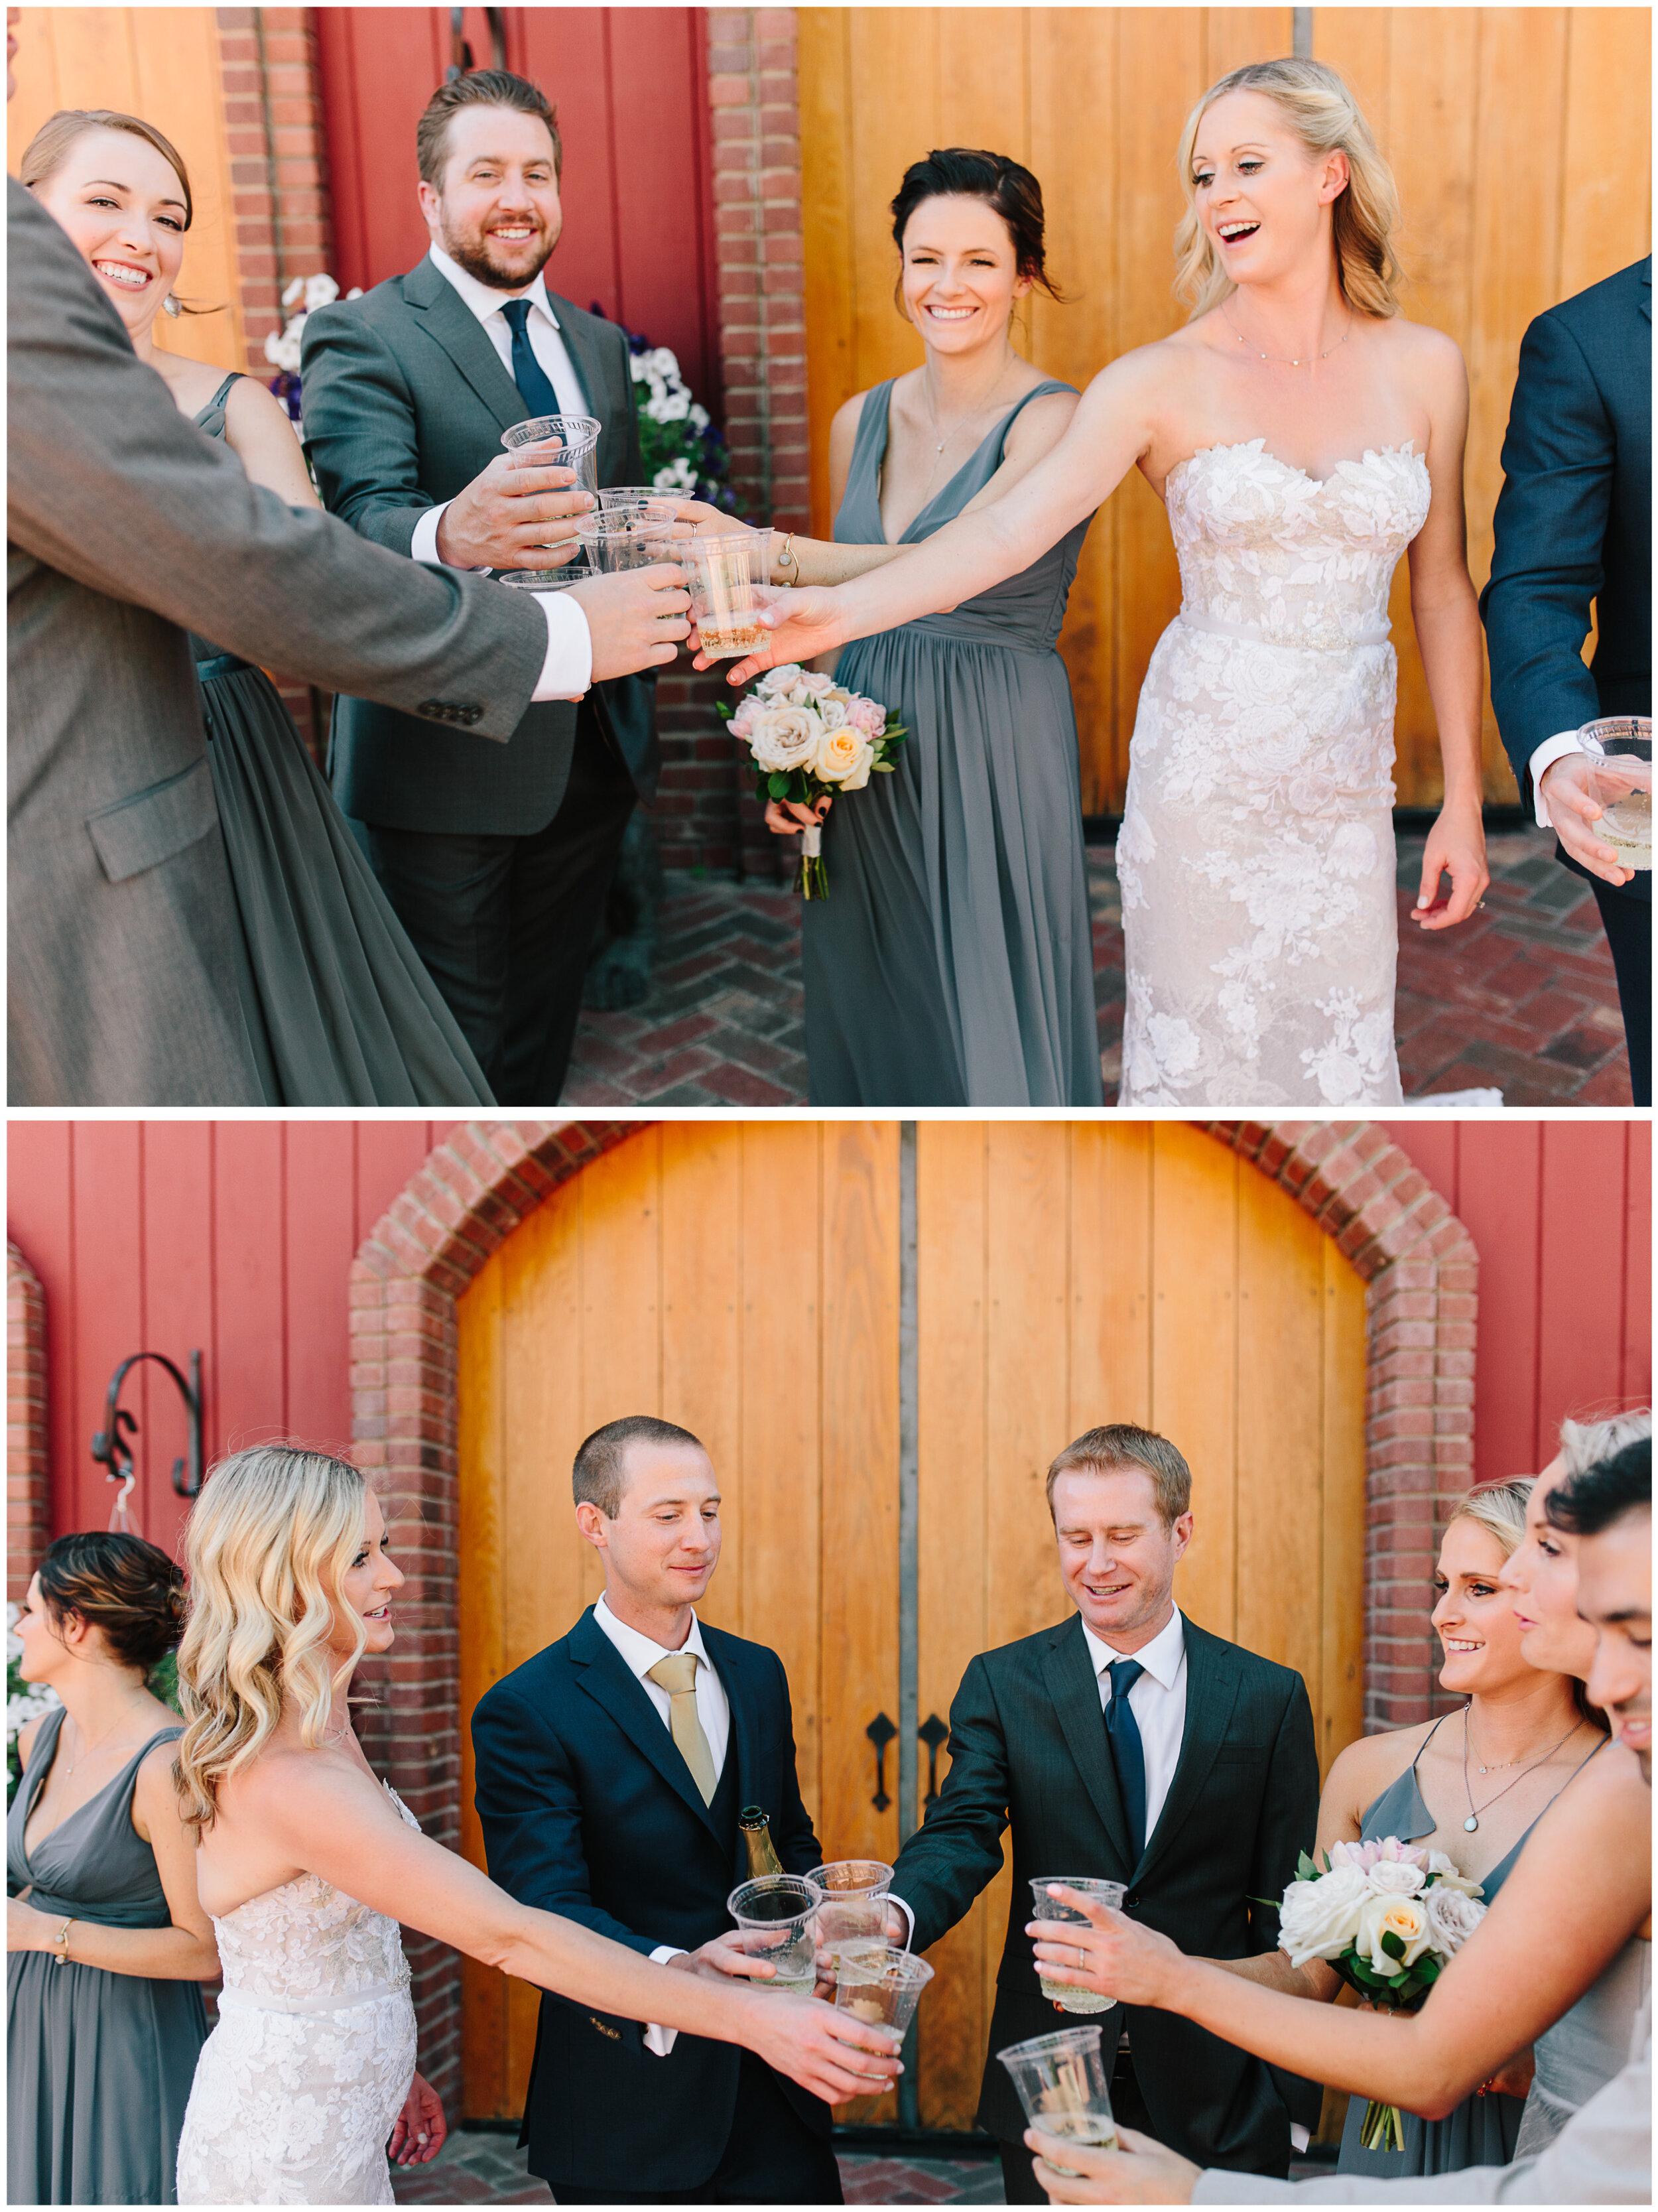 larkspur_colorado_wedding_34.jpg